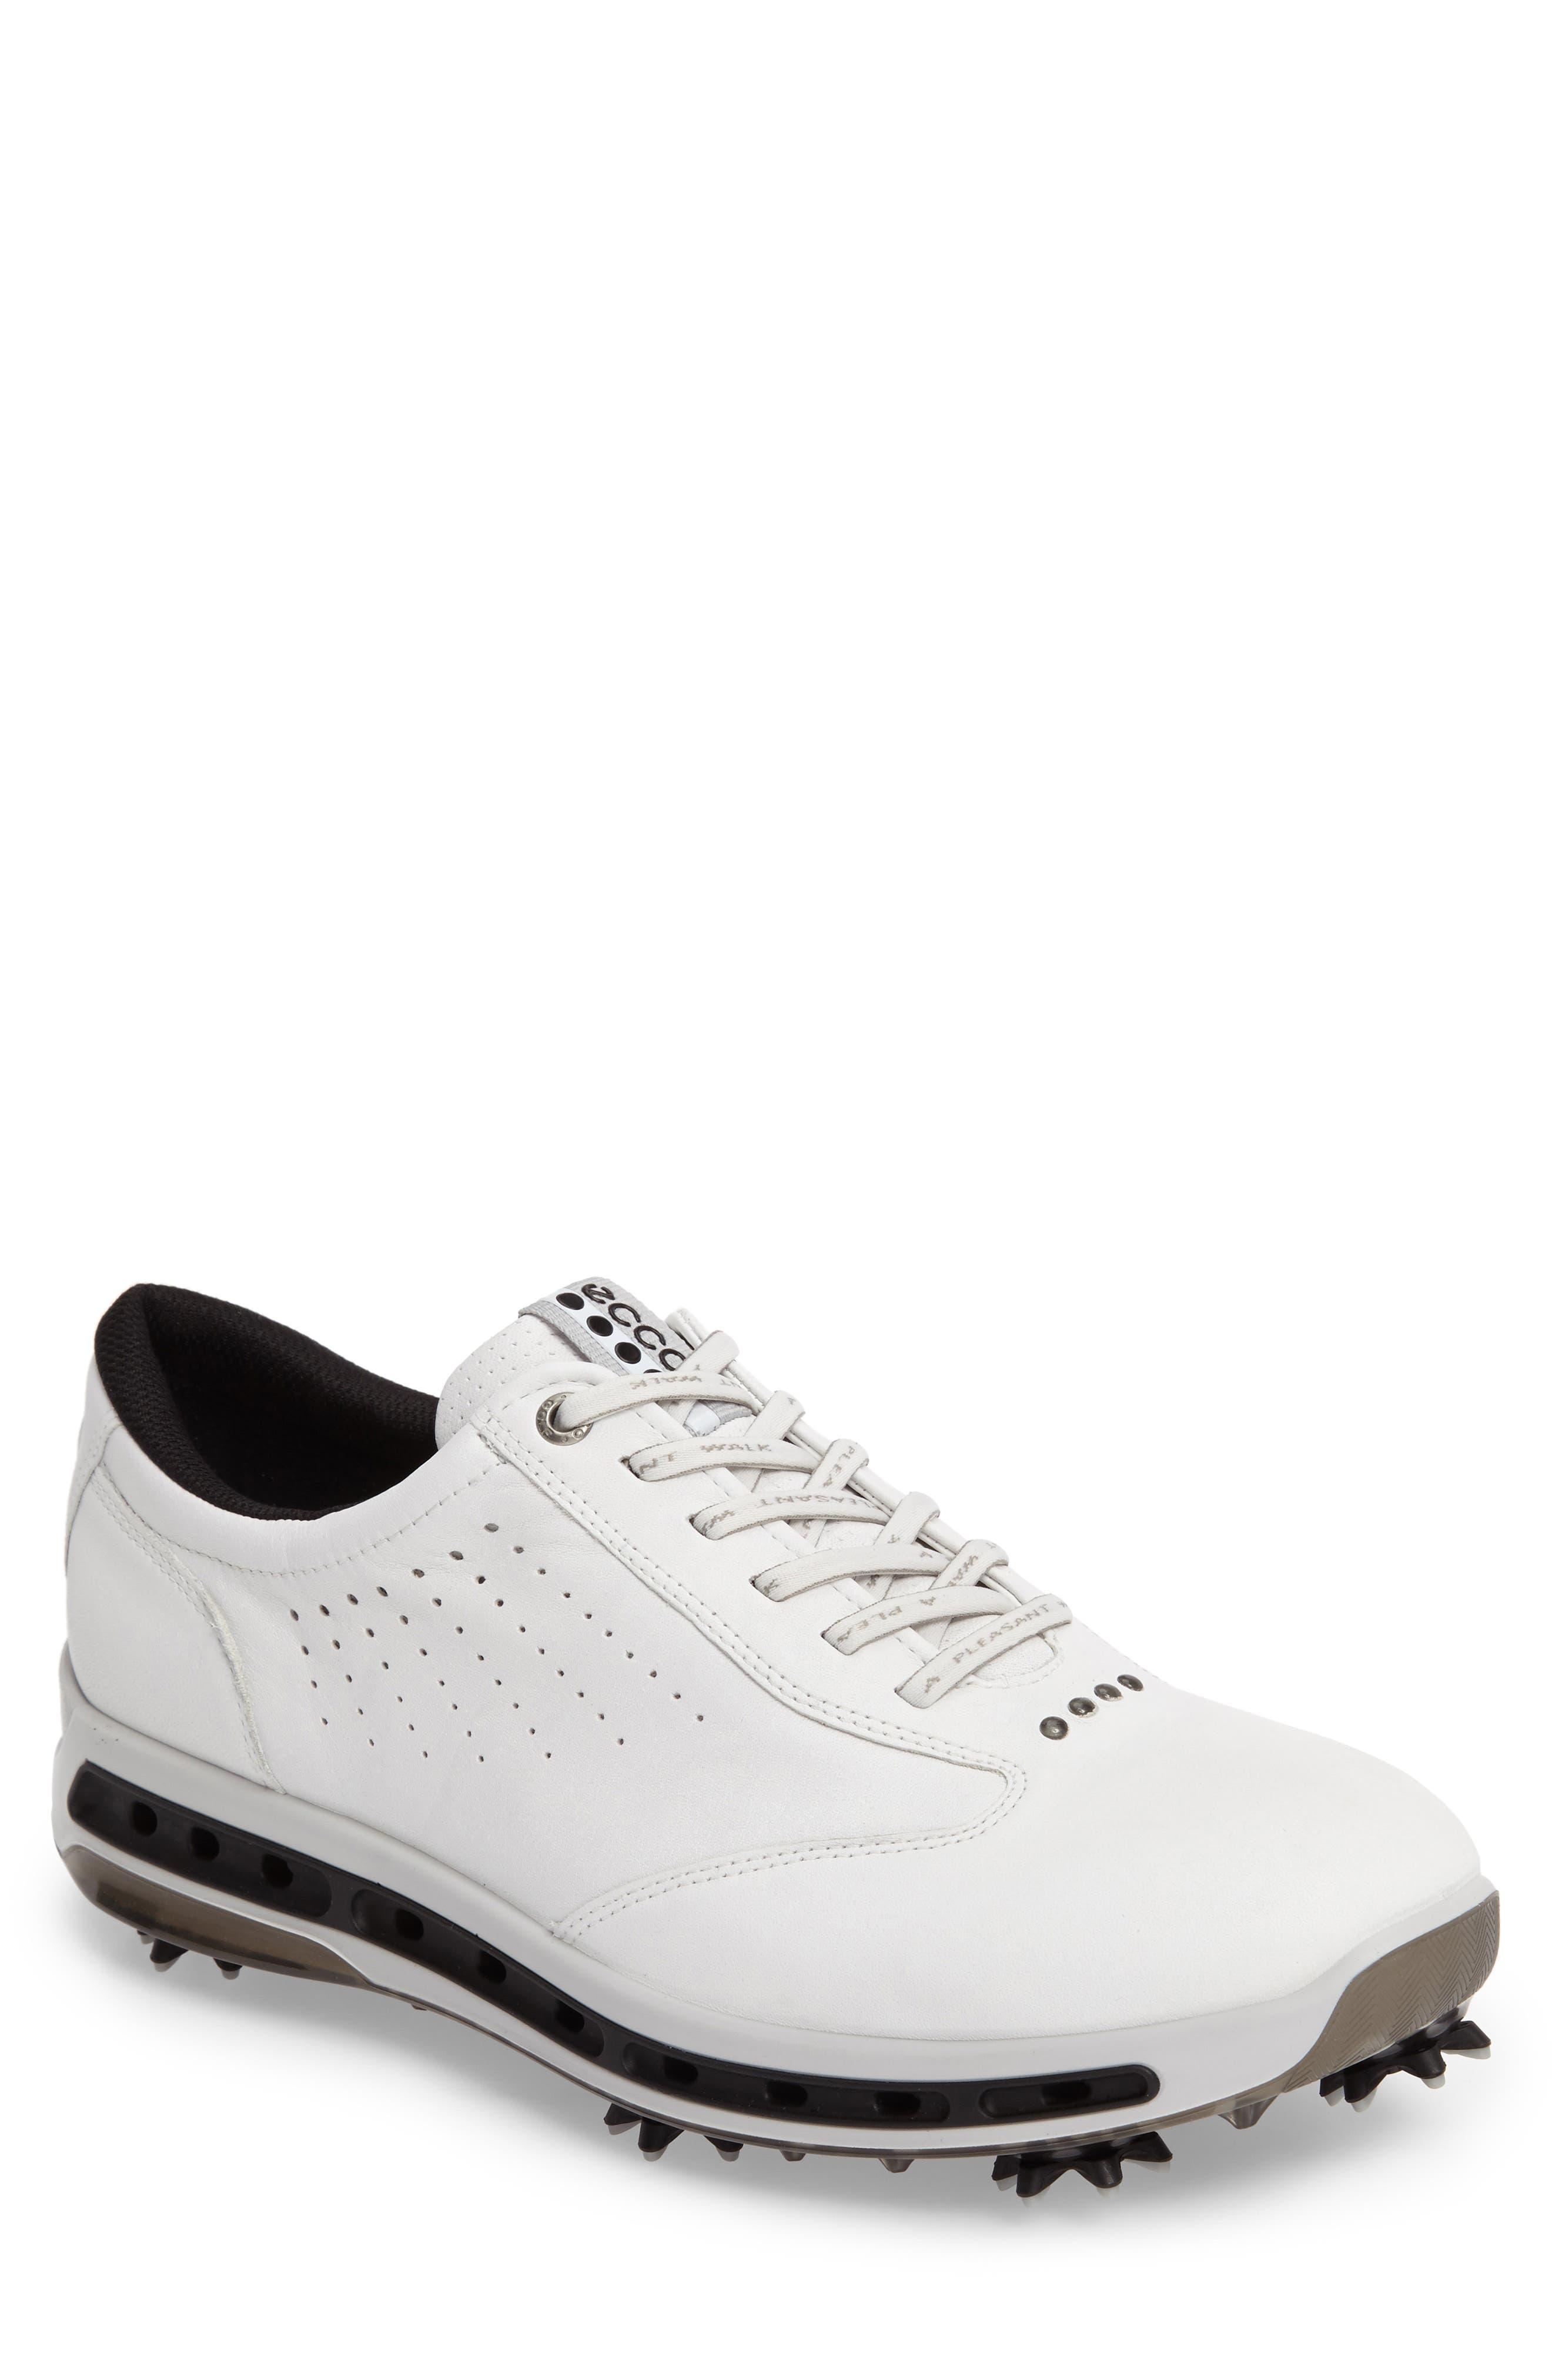 Alternate Image 1 Selected - ECCO Cool GTX Golf Shoe (Men)